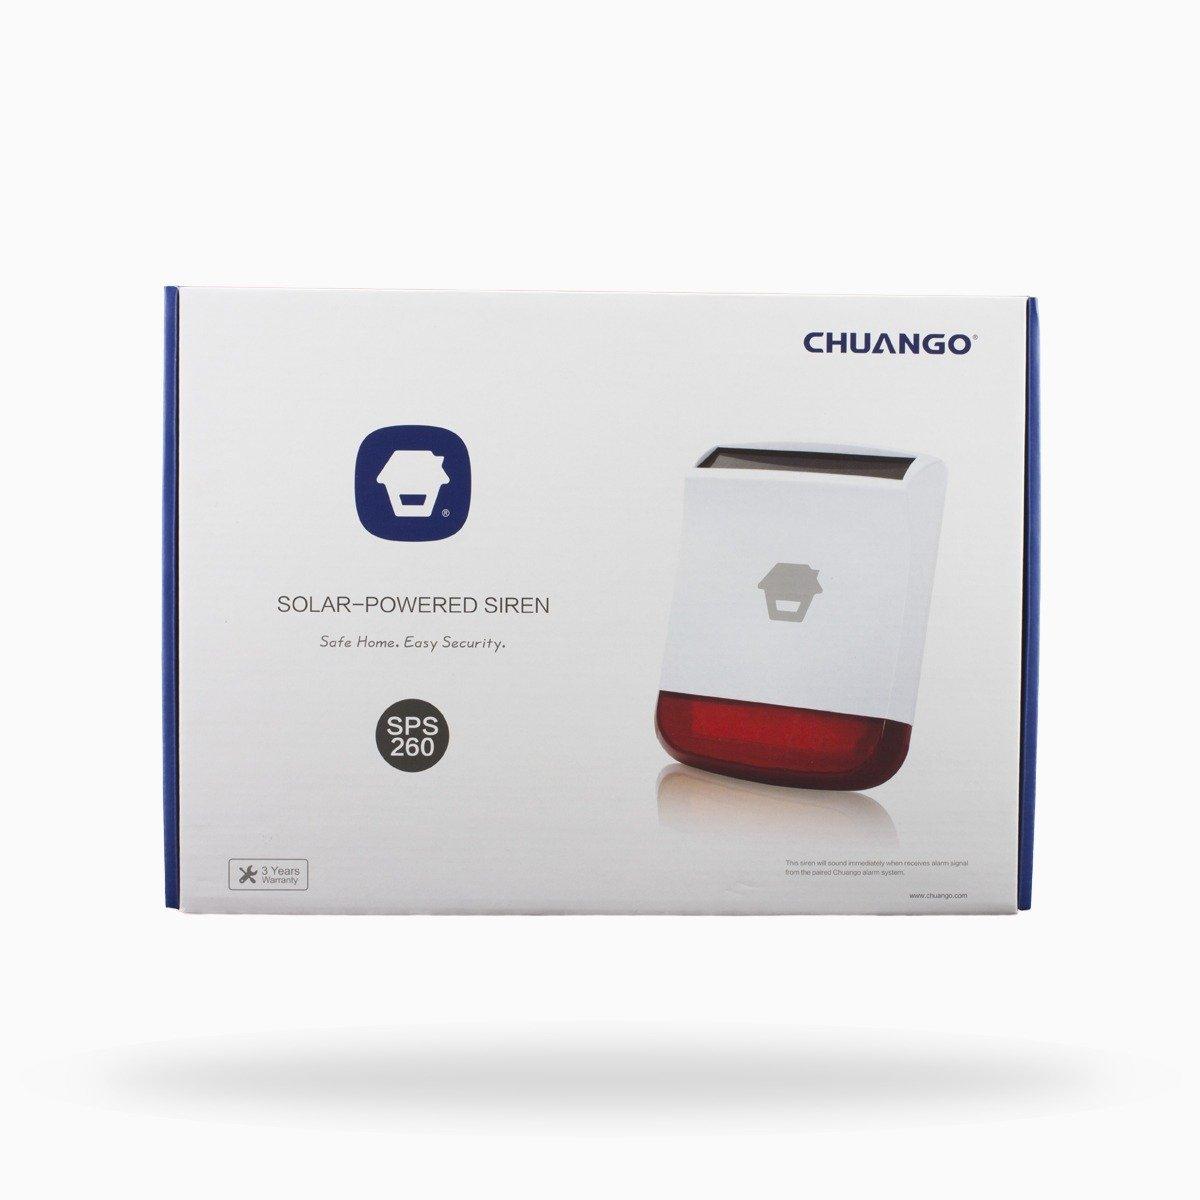 Chuango CG-8800G3 Blanco Sistema de Alarma de Seguridad - Sistemas de Alarma de Seguridad (110 dB, -10-55 °C, Blanco, Sensor, 110-240, 7,4 V)